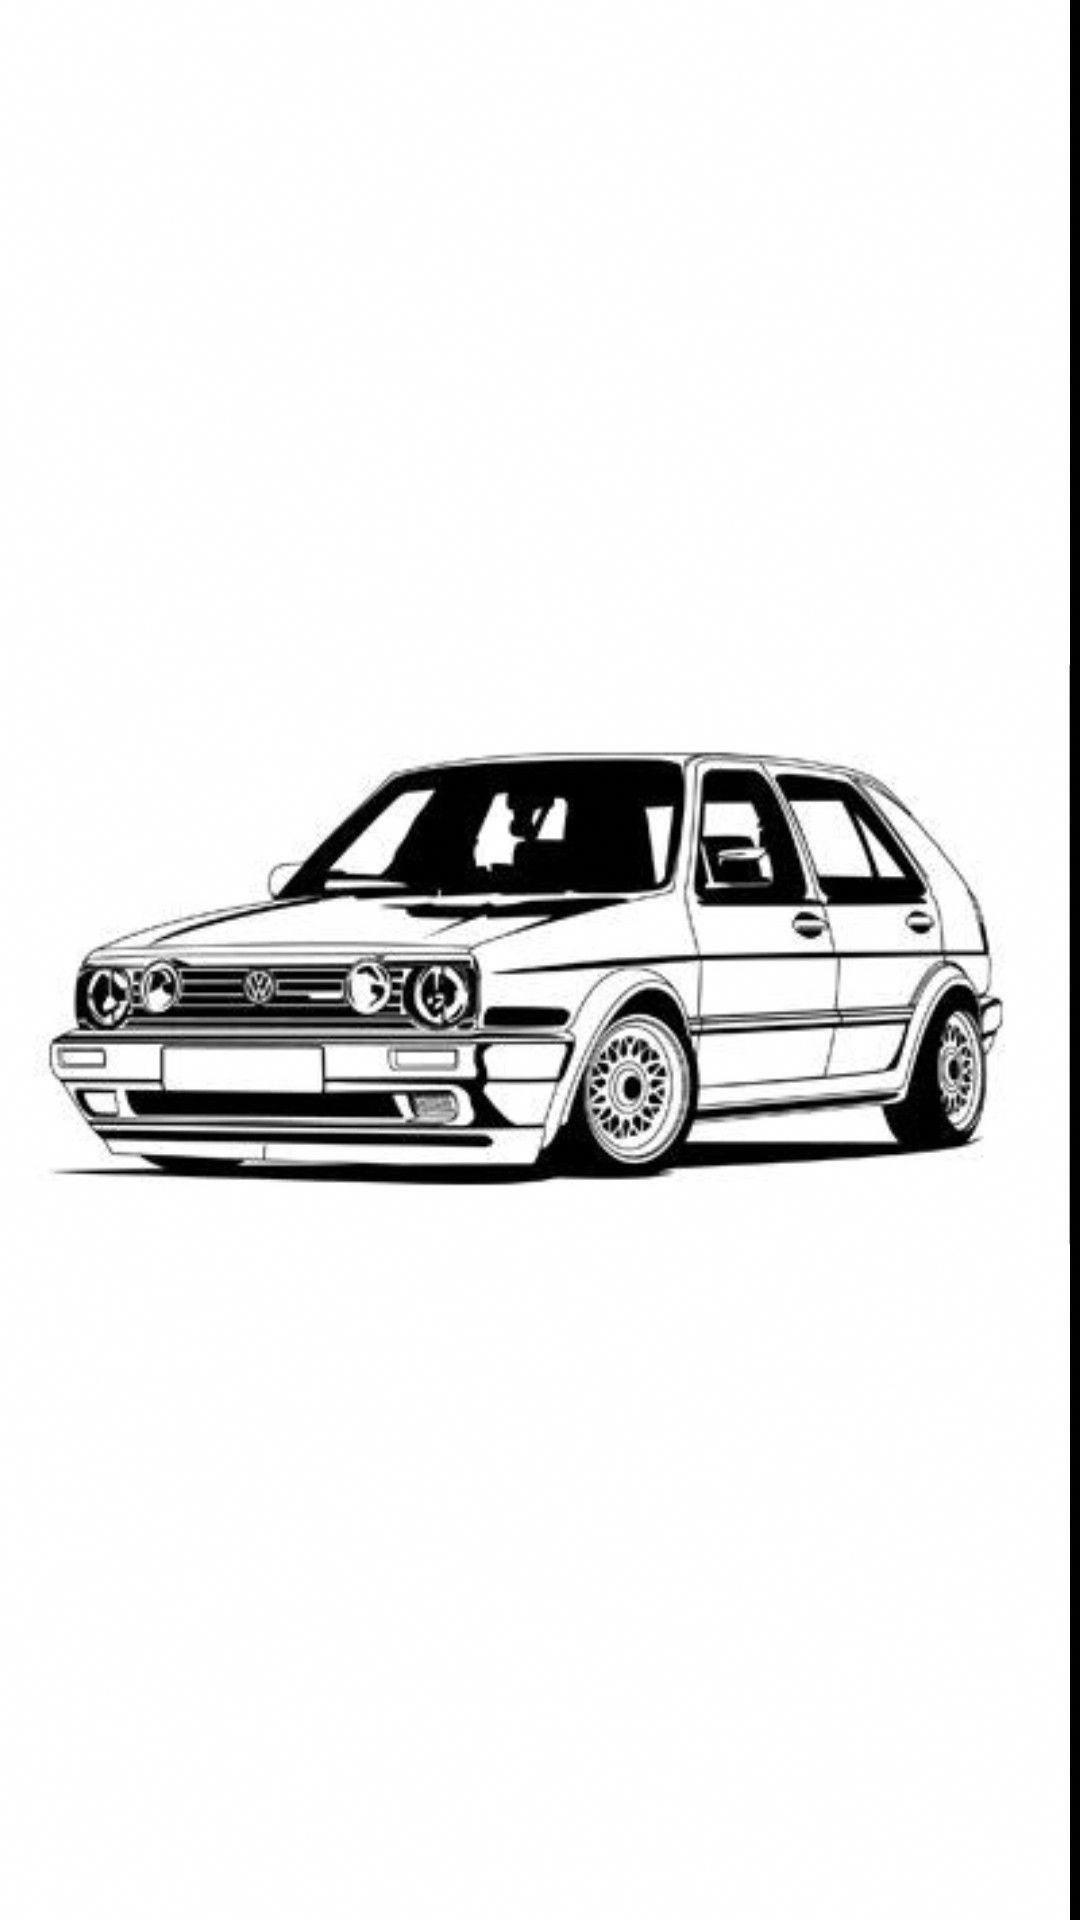 Volkswagengolfmk2accessories Volkswagengolfmk2custom Volkswagen Golf Mk2 Volkswagen Golf Golf Mk2